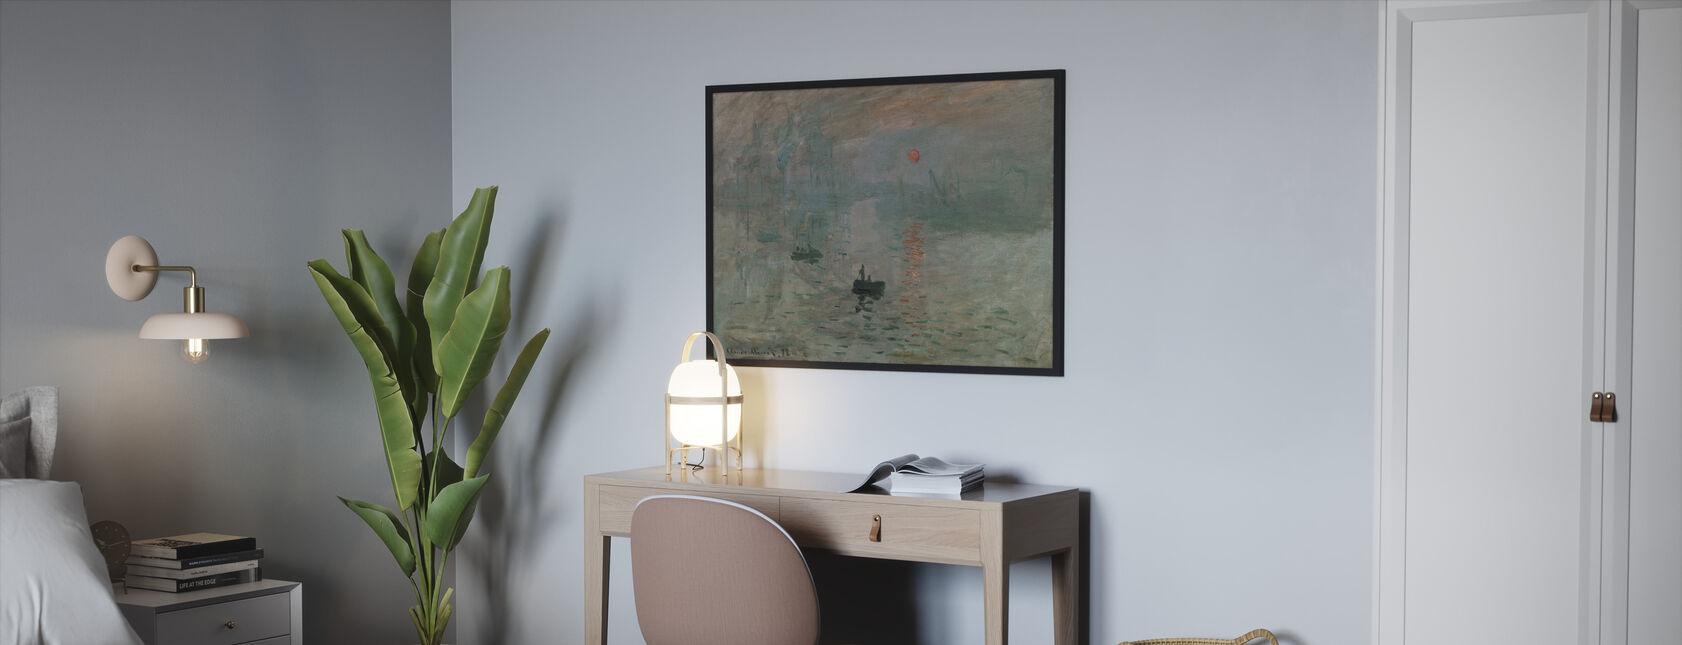 Monet, Claud - Impressie - Ingelijste print - Slaapkamer